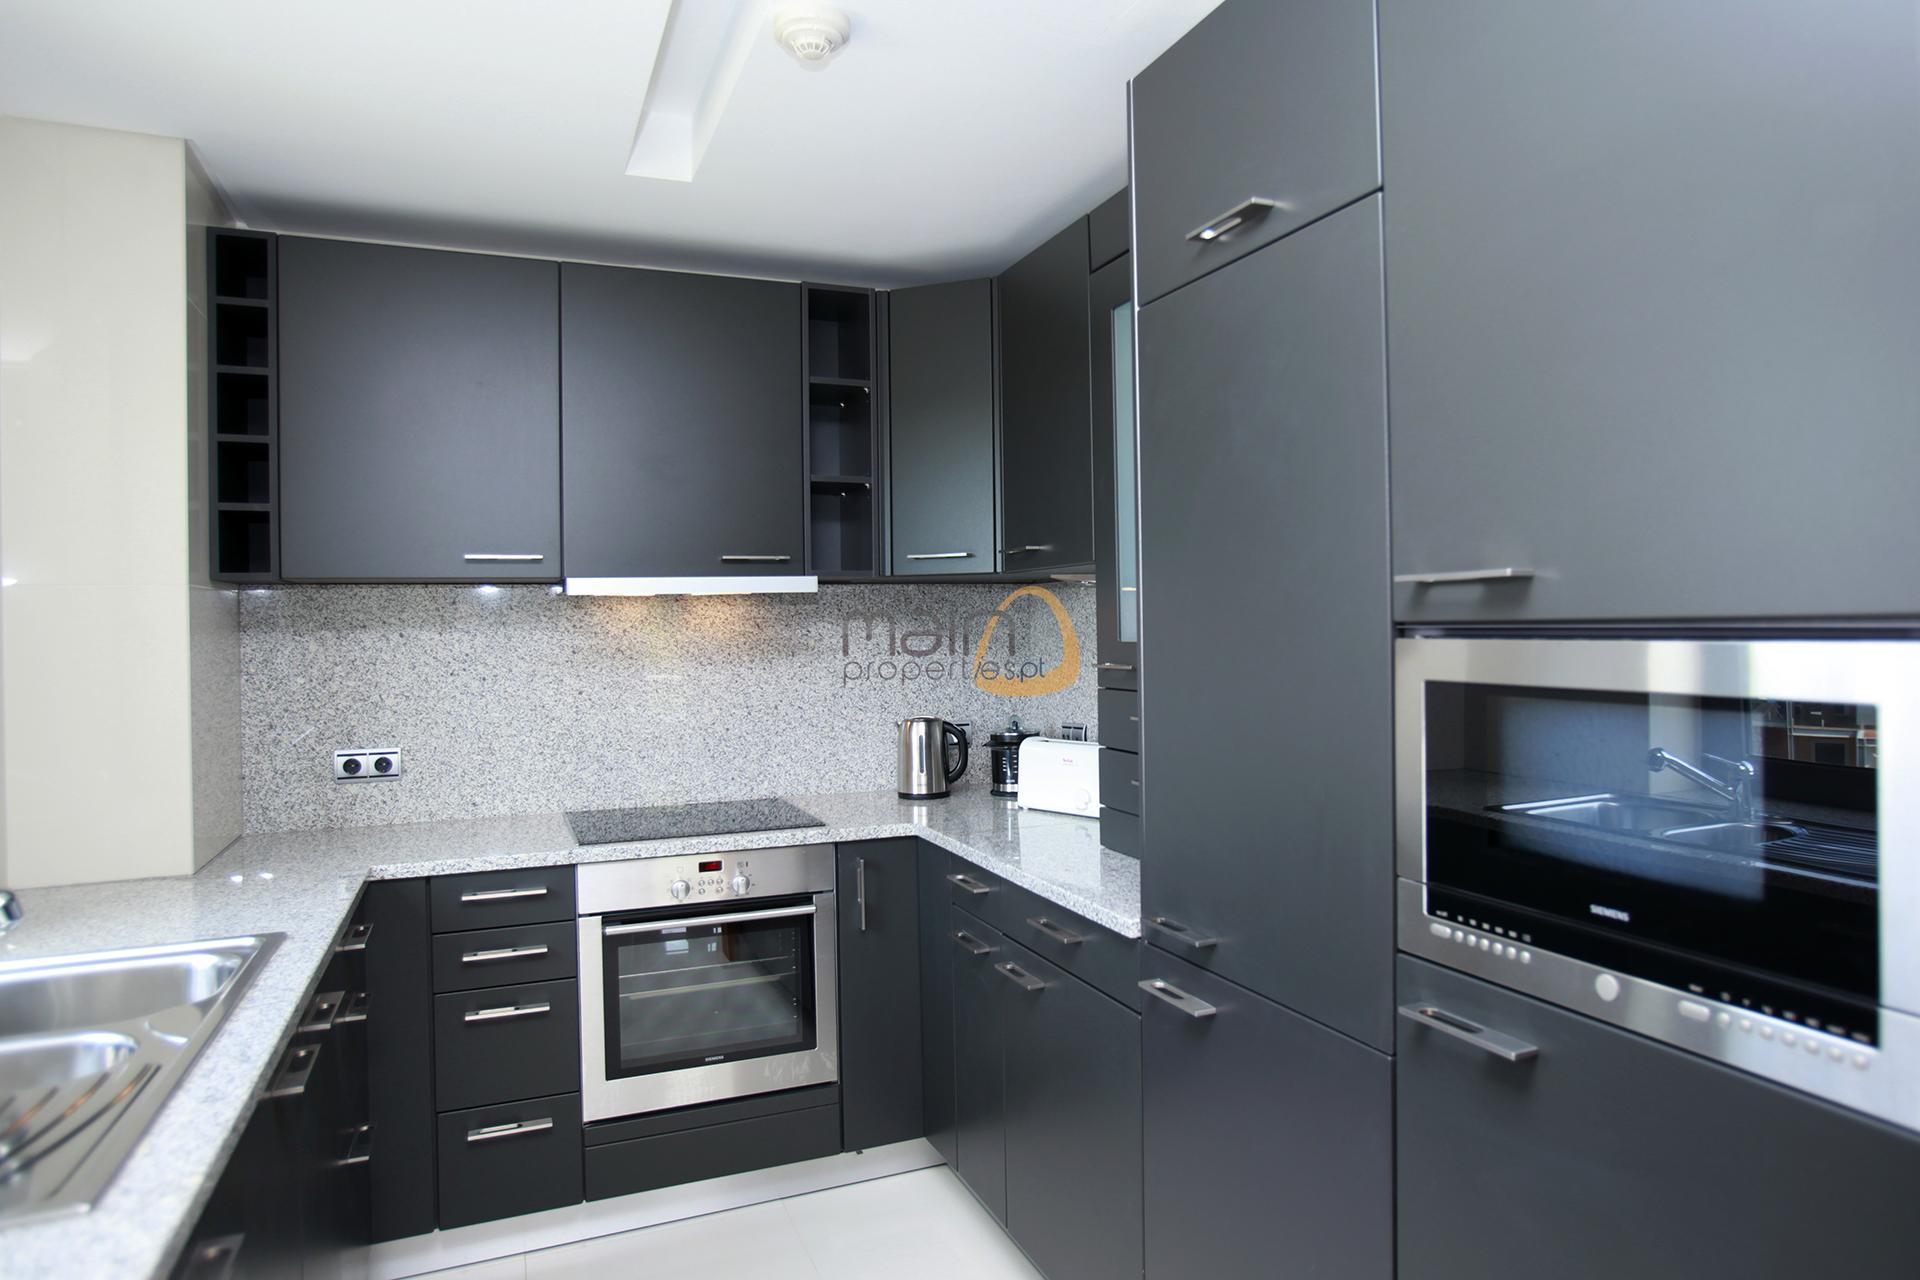 apartment-in-vale-do-lobo-algarve-golden-triangle-portugal-property-real-estate-mainproperties-mp135vdl-5